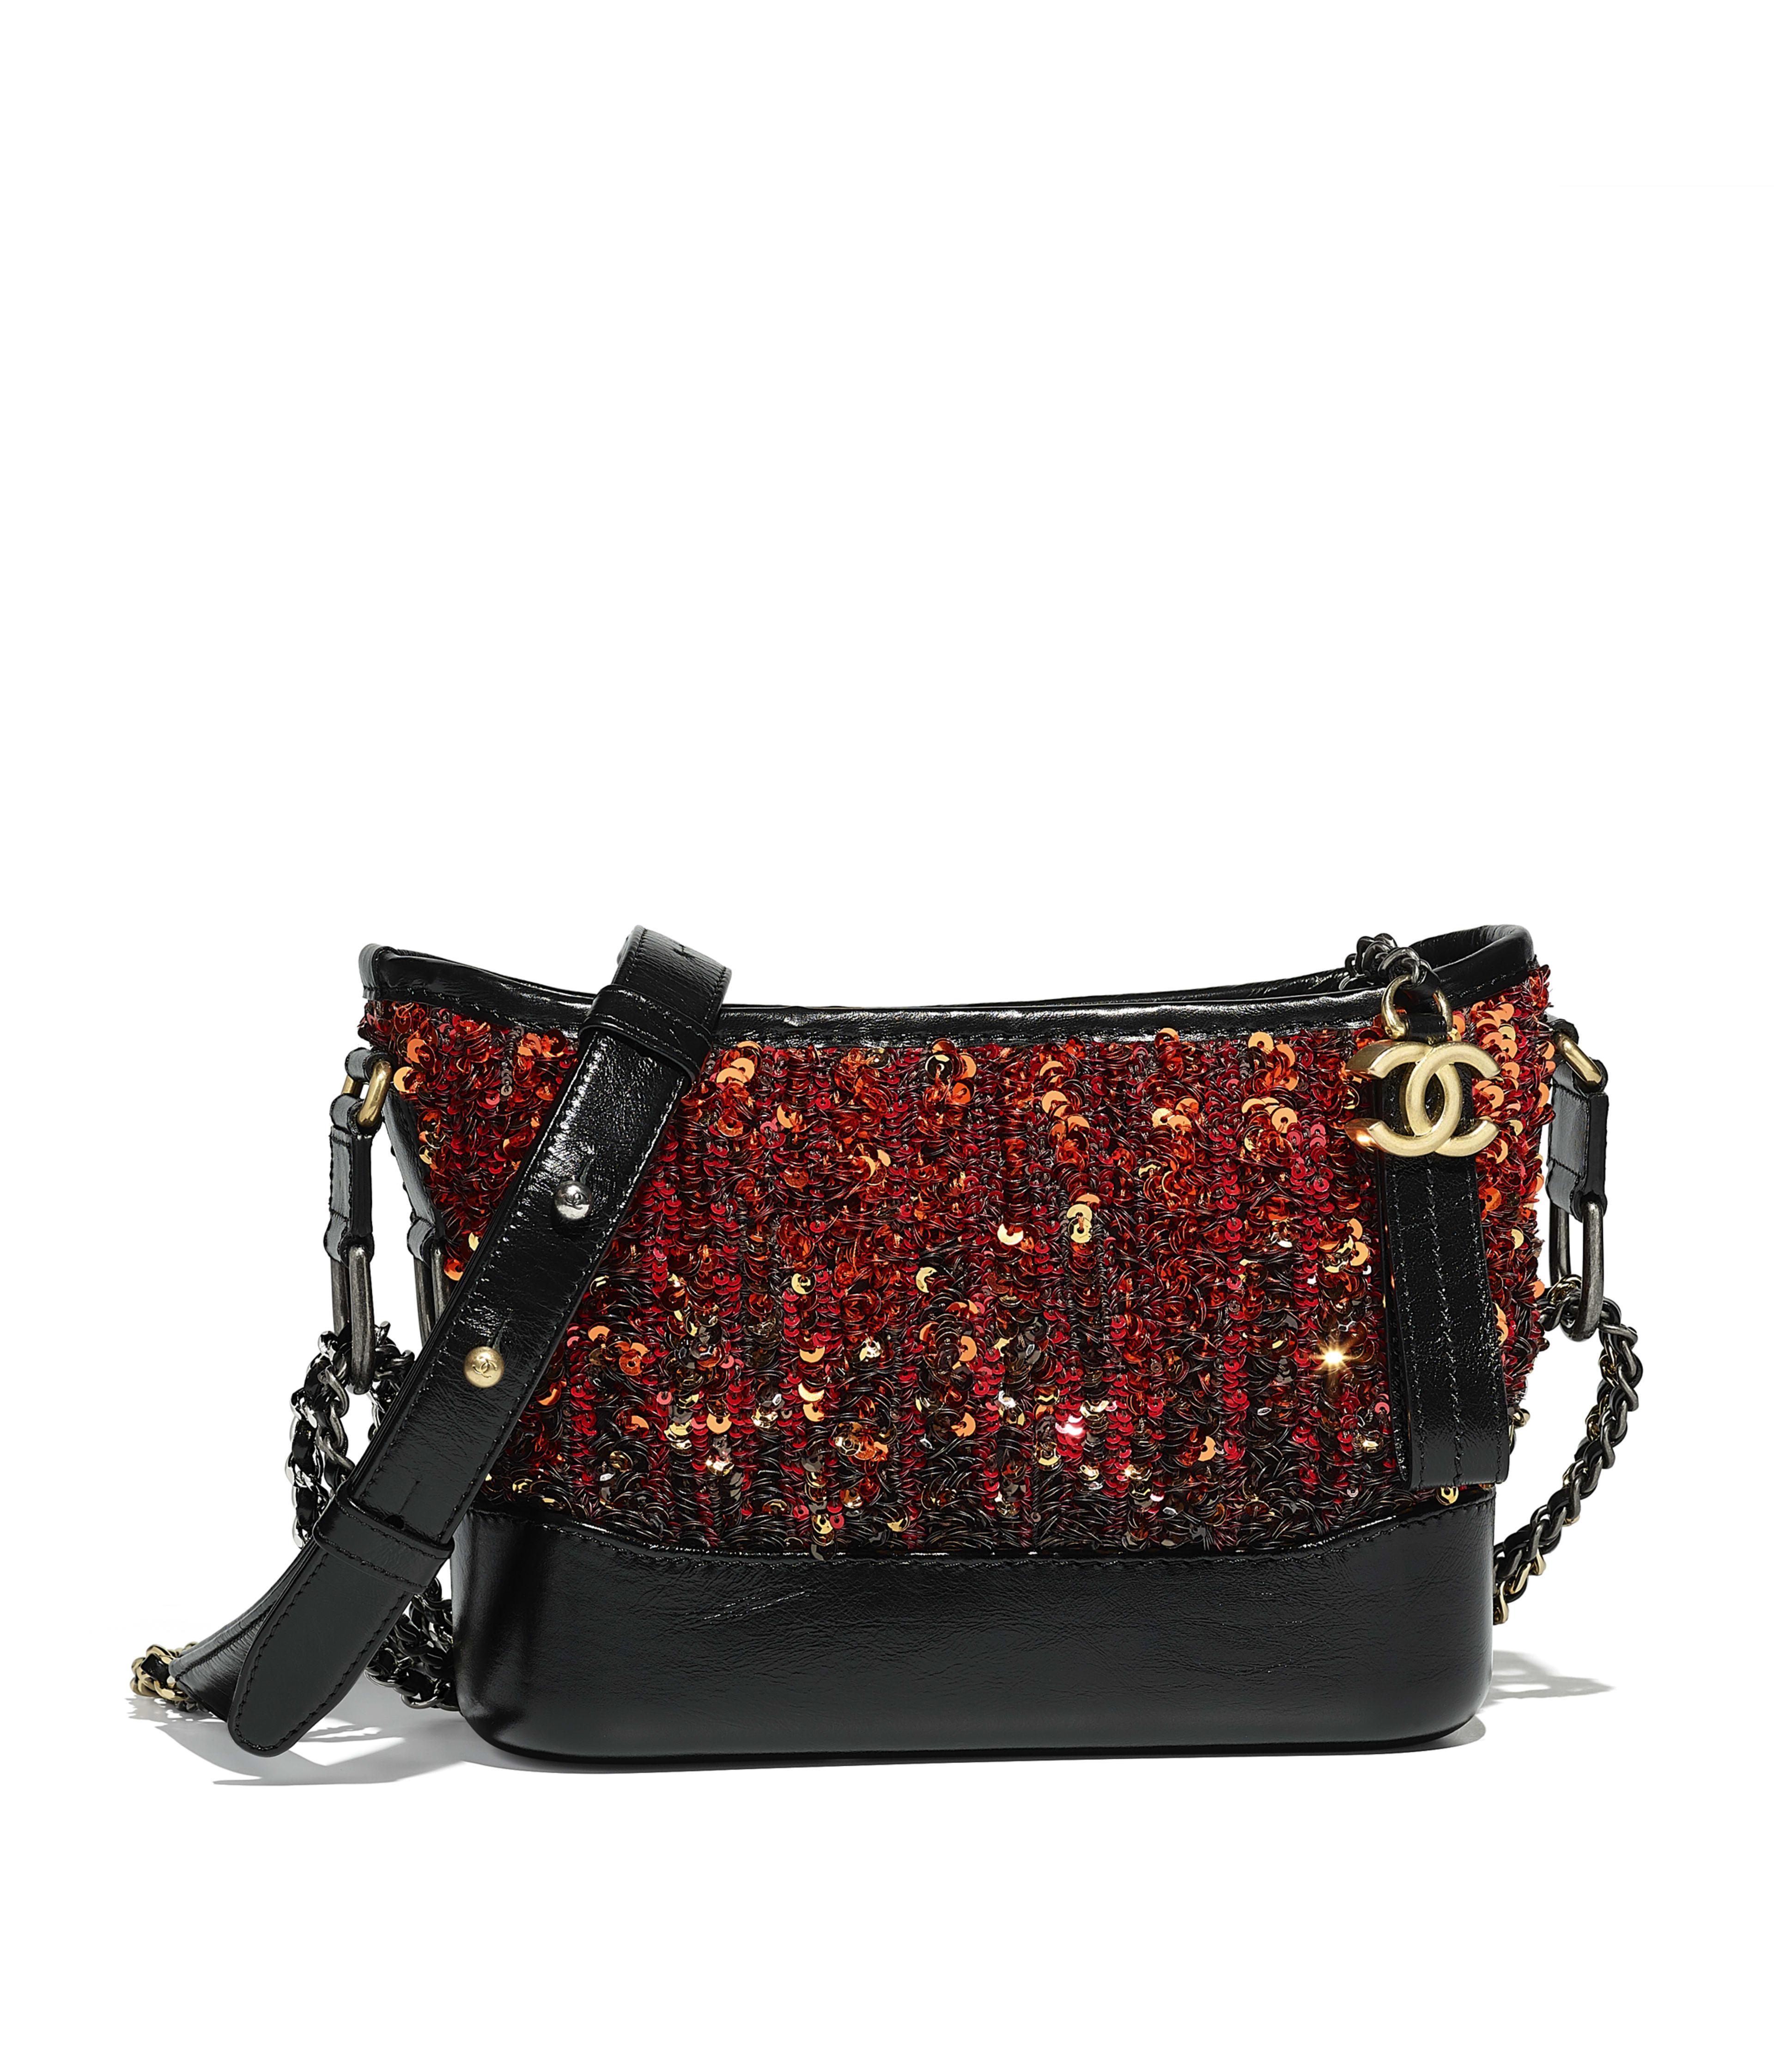 Chanel S Gabrielle Small Hobo Bag Sequins Calfksin Silver Tone Gold Metal Orange Black Ref A91810y83946c2017